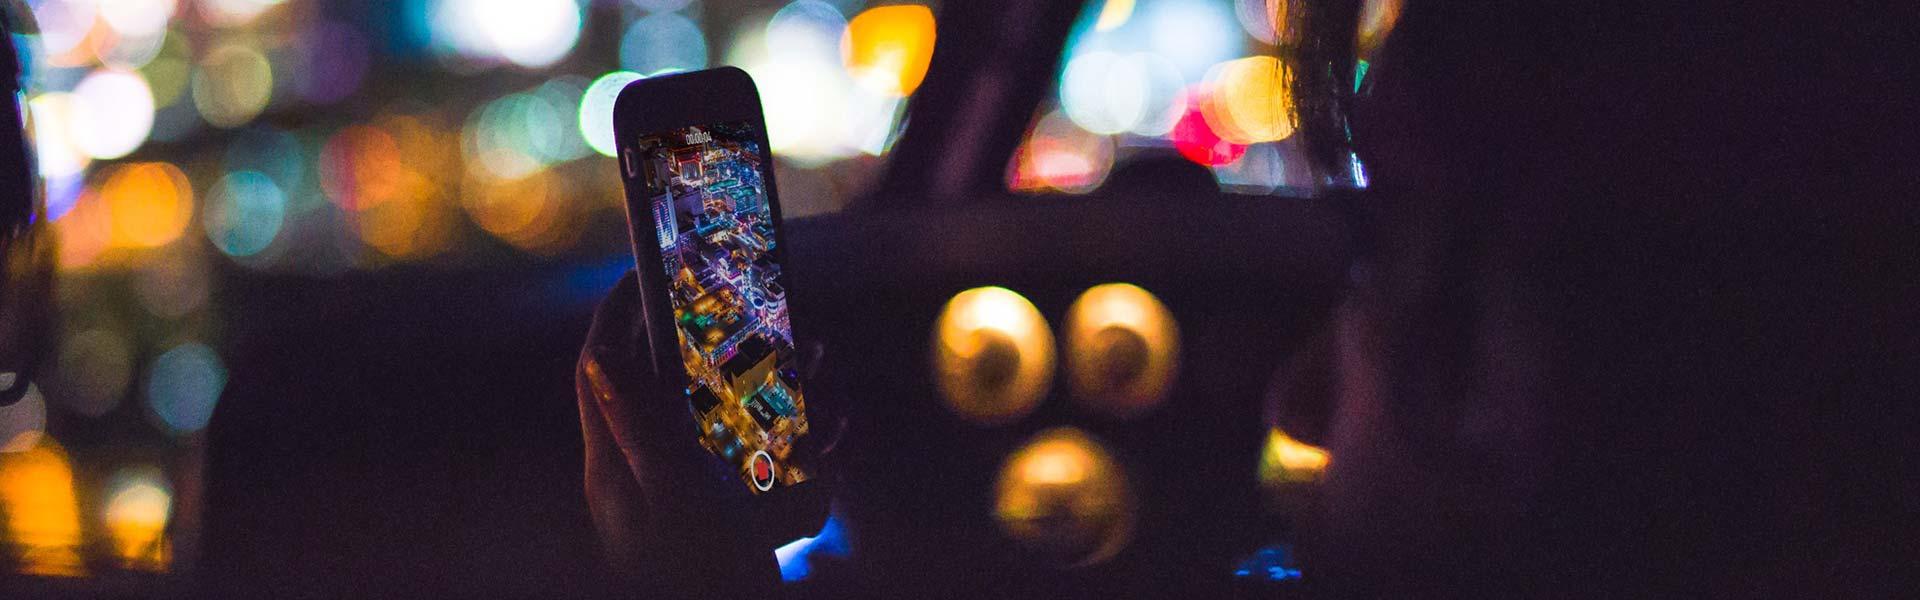 iPhone recording lights